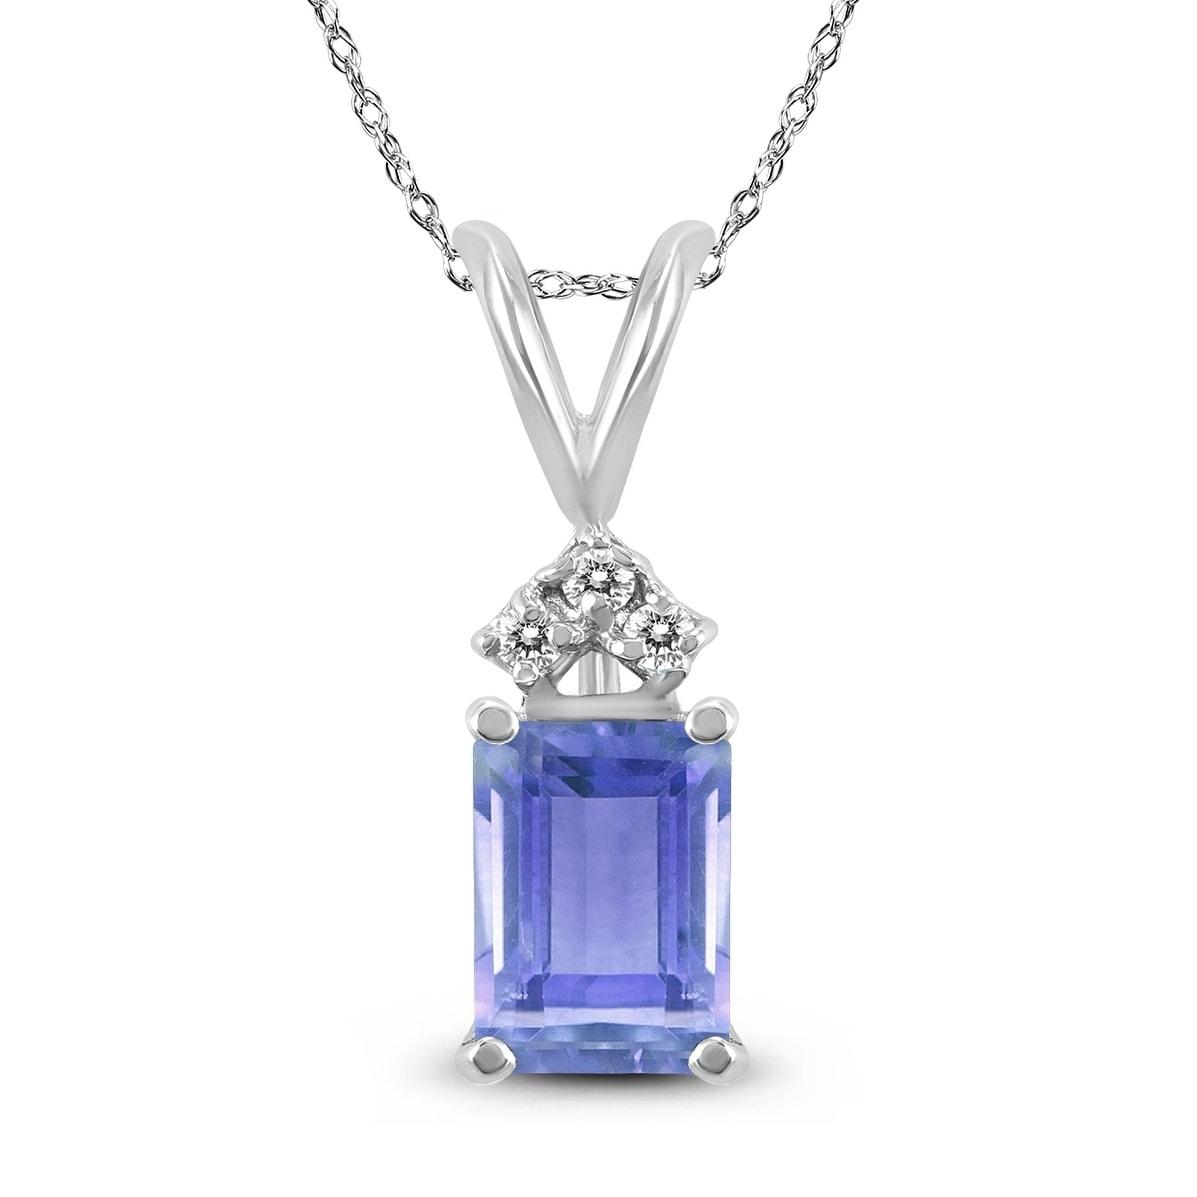 DiamondJewelryNY Sterling Silver St Joseph Pendant